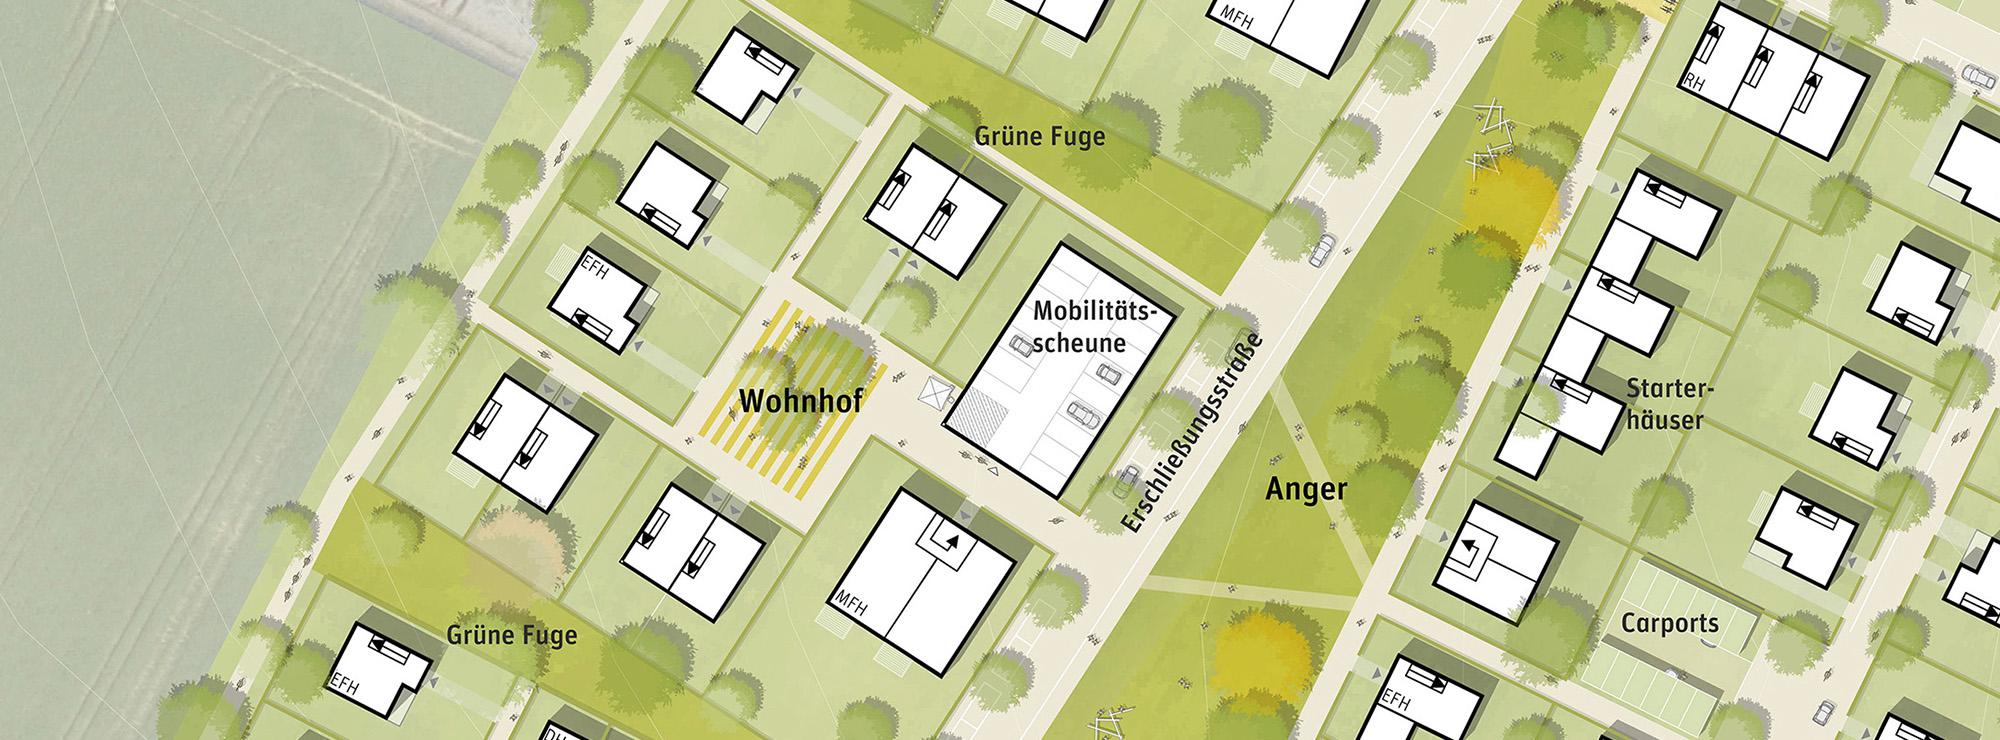 Warburg_Laurentiushöhe_4